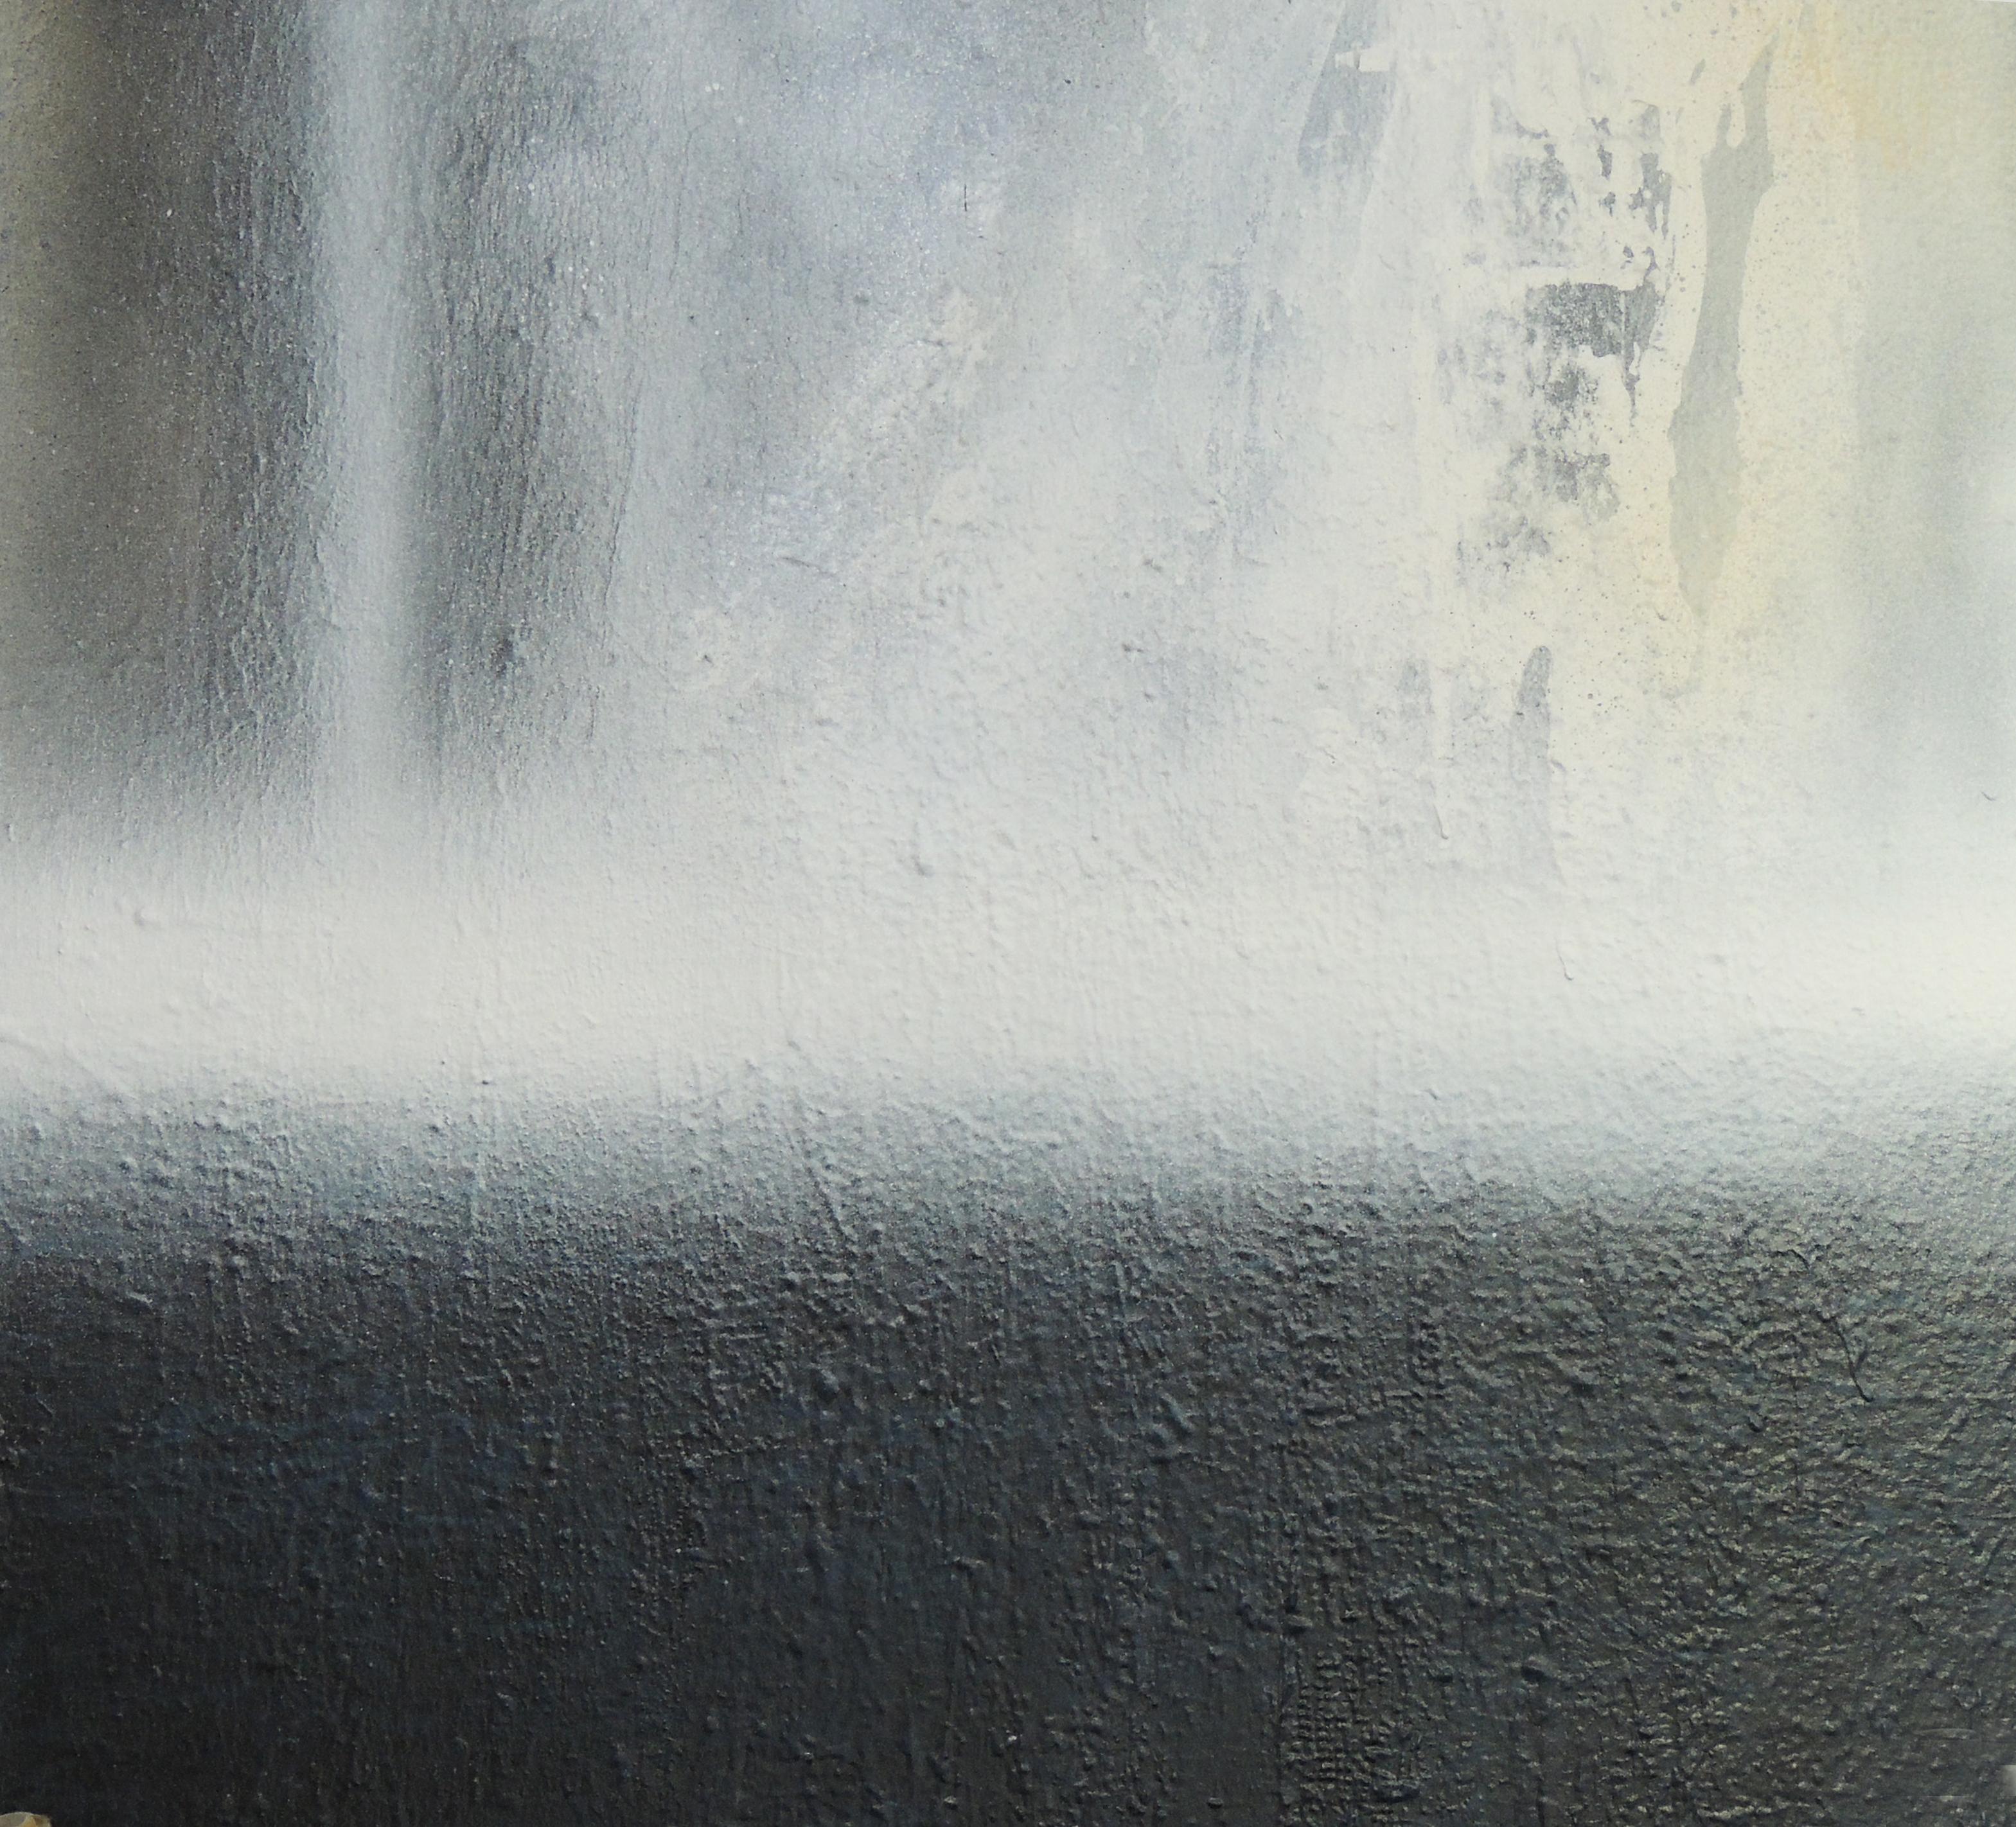 Misty fall.91x83.1200